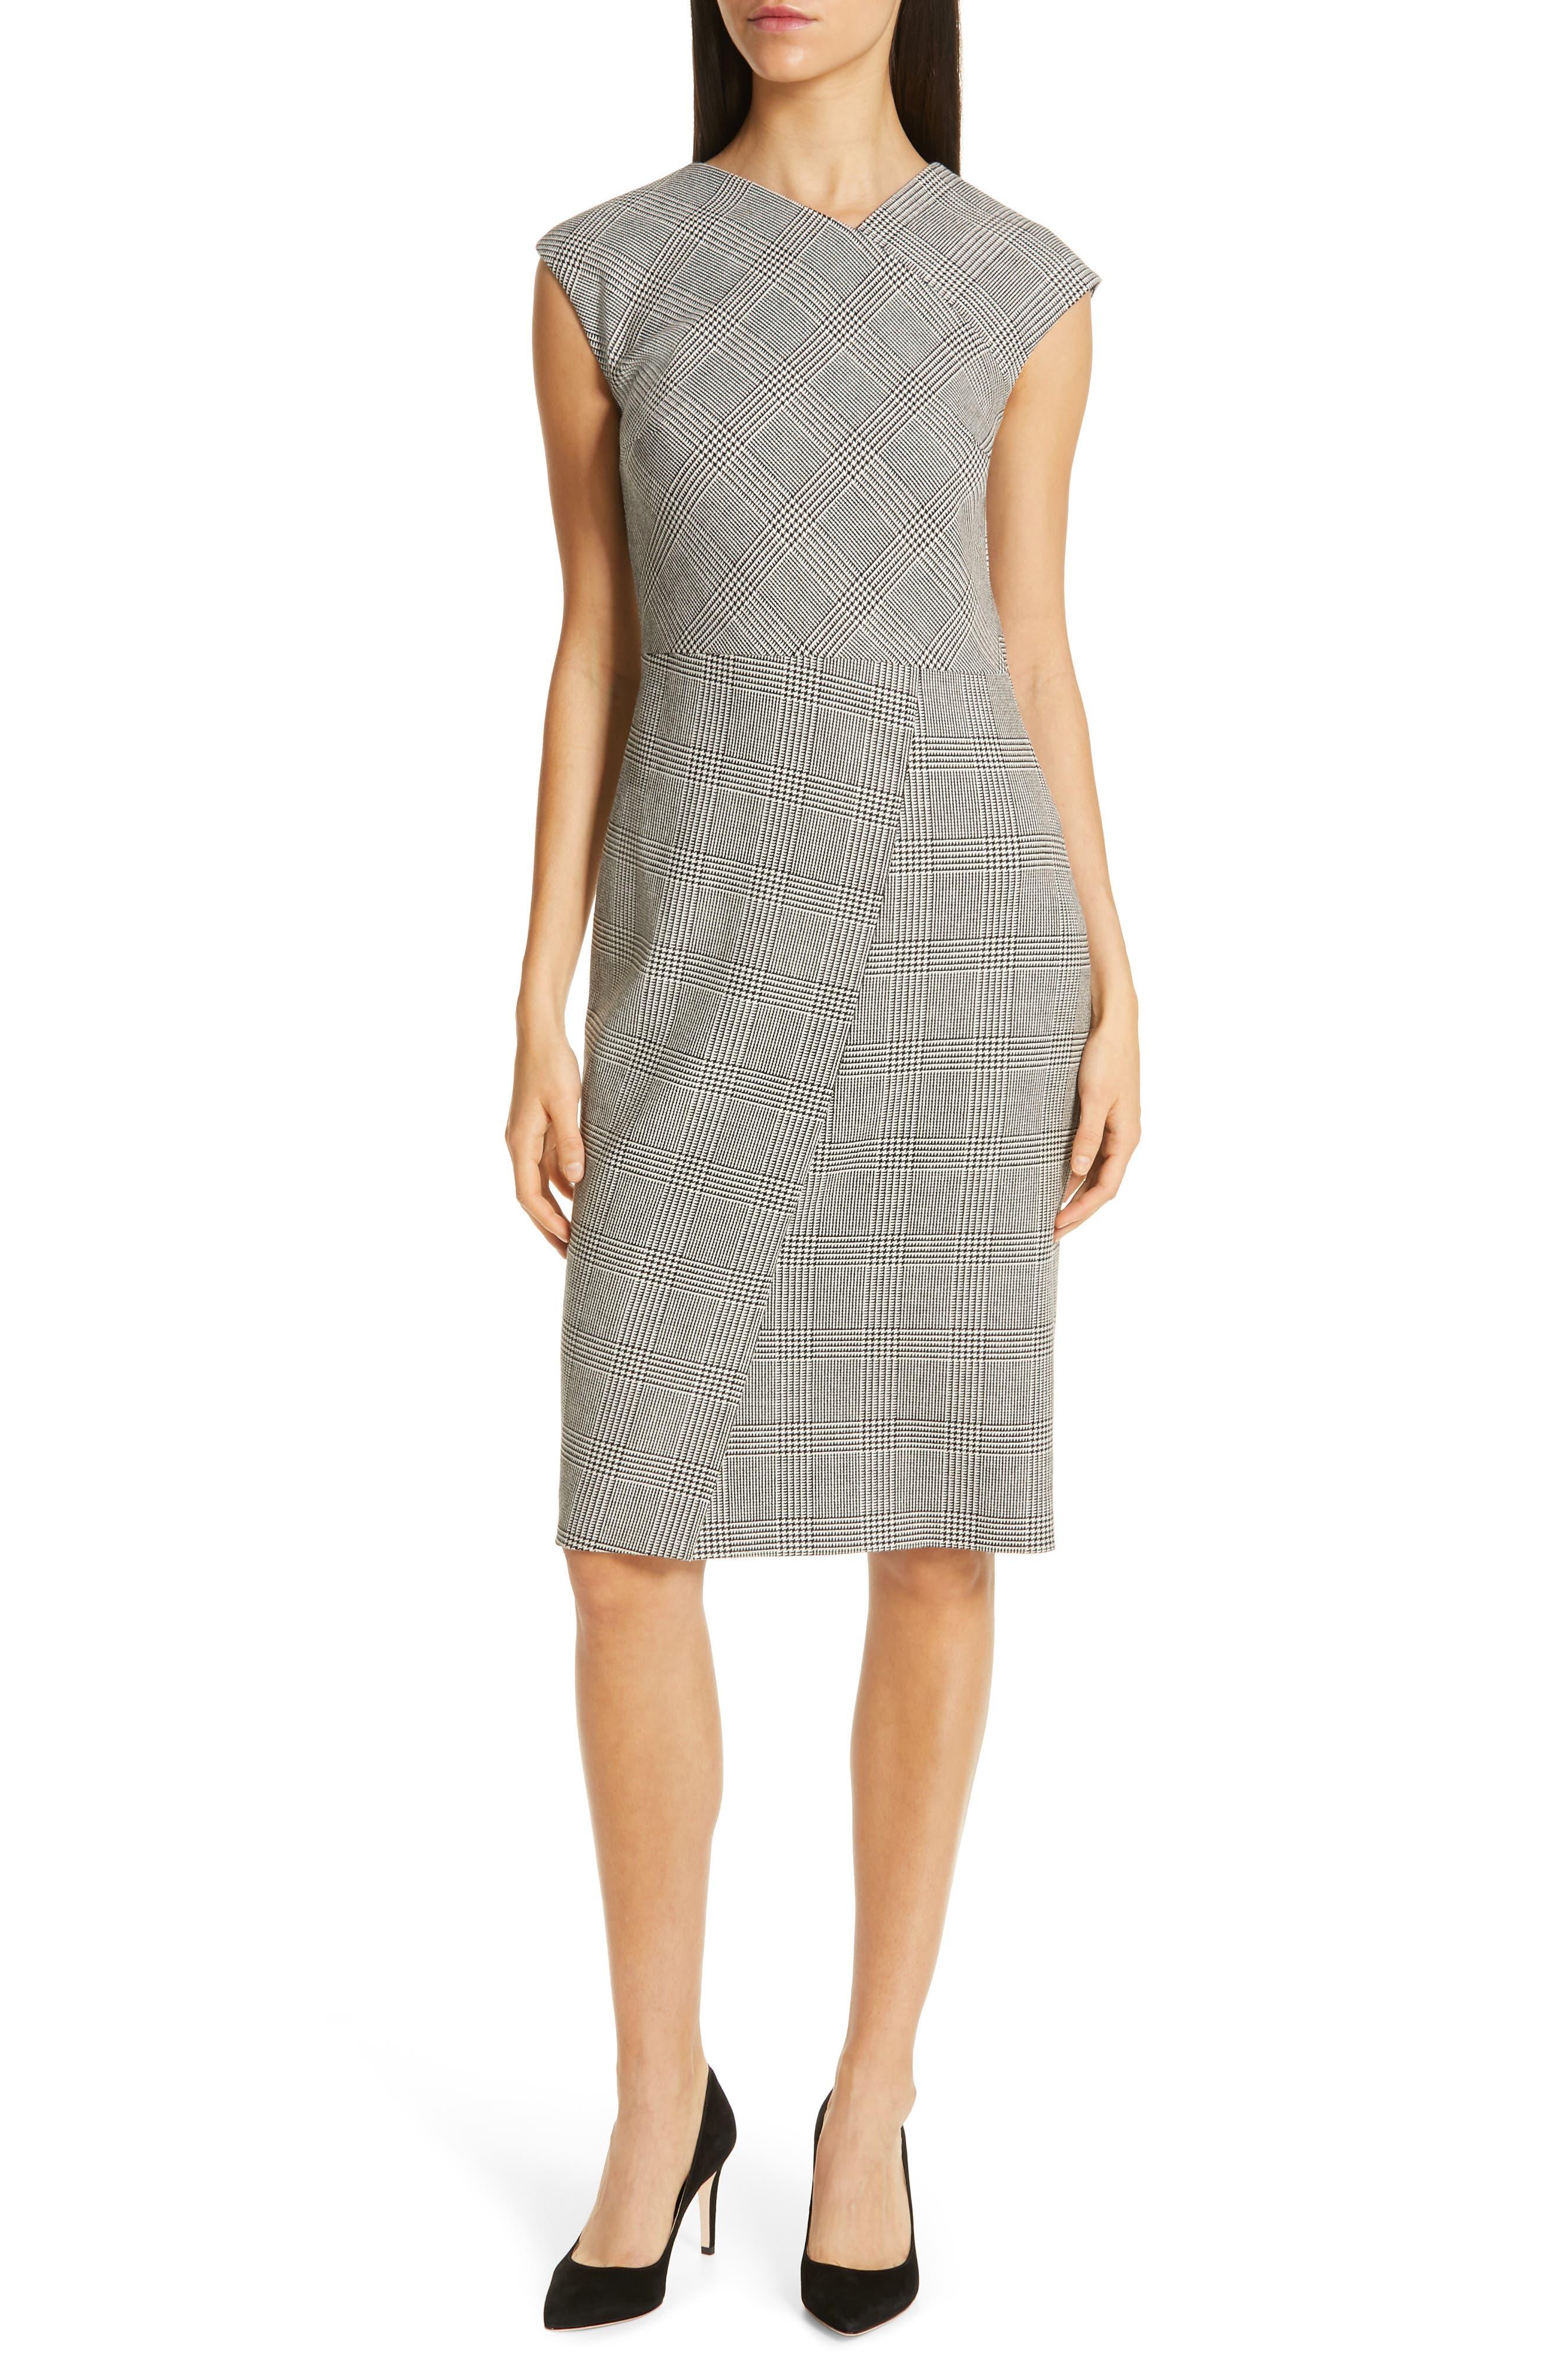 BOSS, Dechesta Glen Plaid Sheath Dress, Main thumbnail 1, color, 020